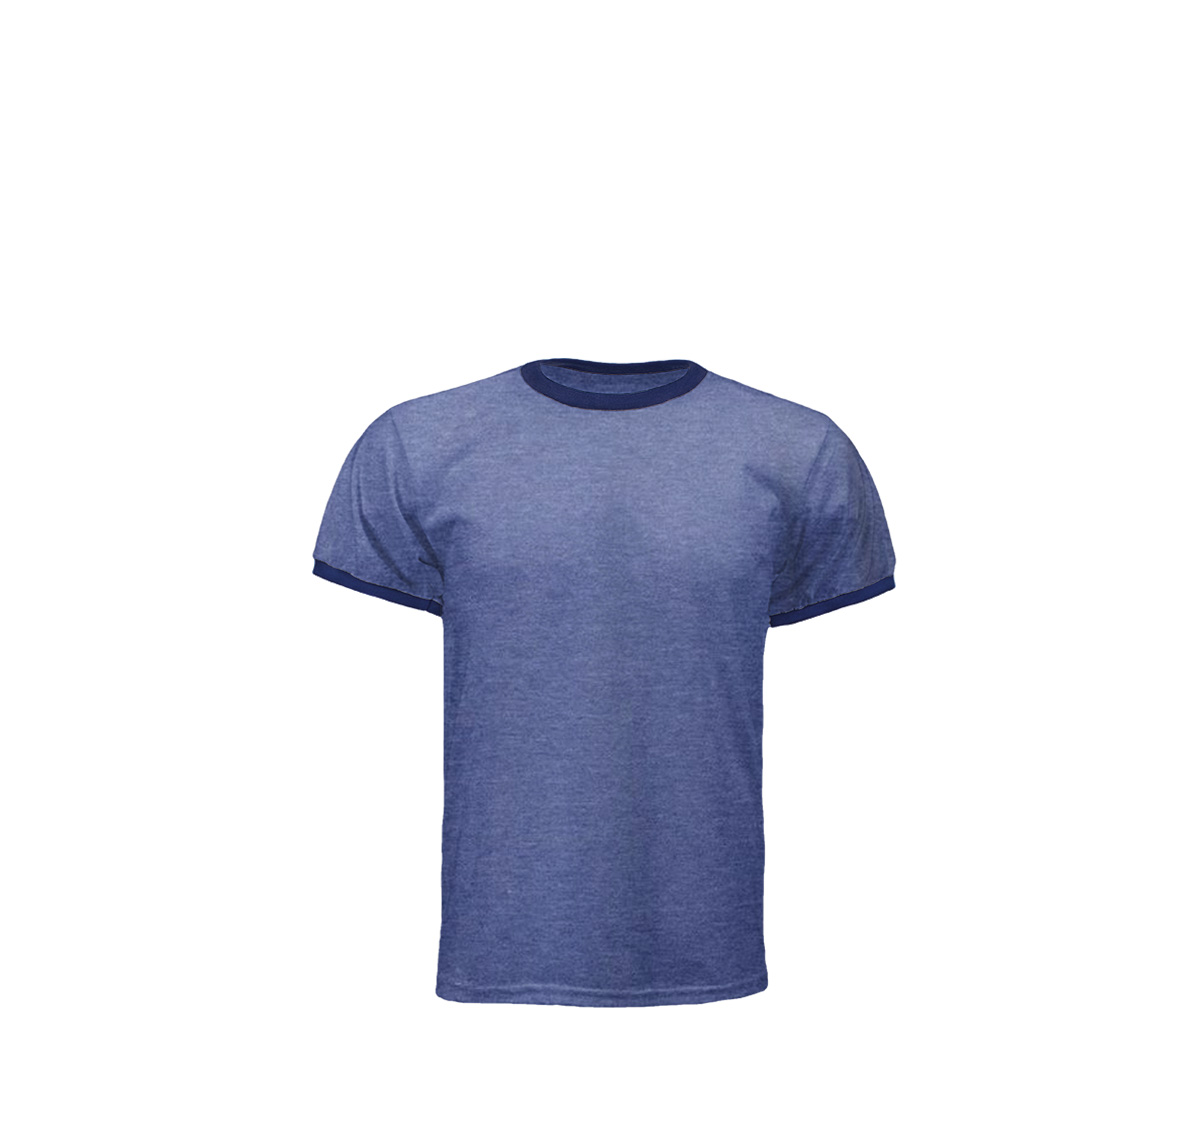 T shirt design york pa - 7 Colors